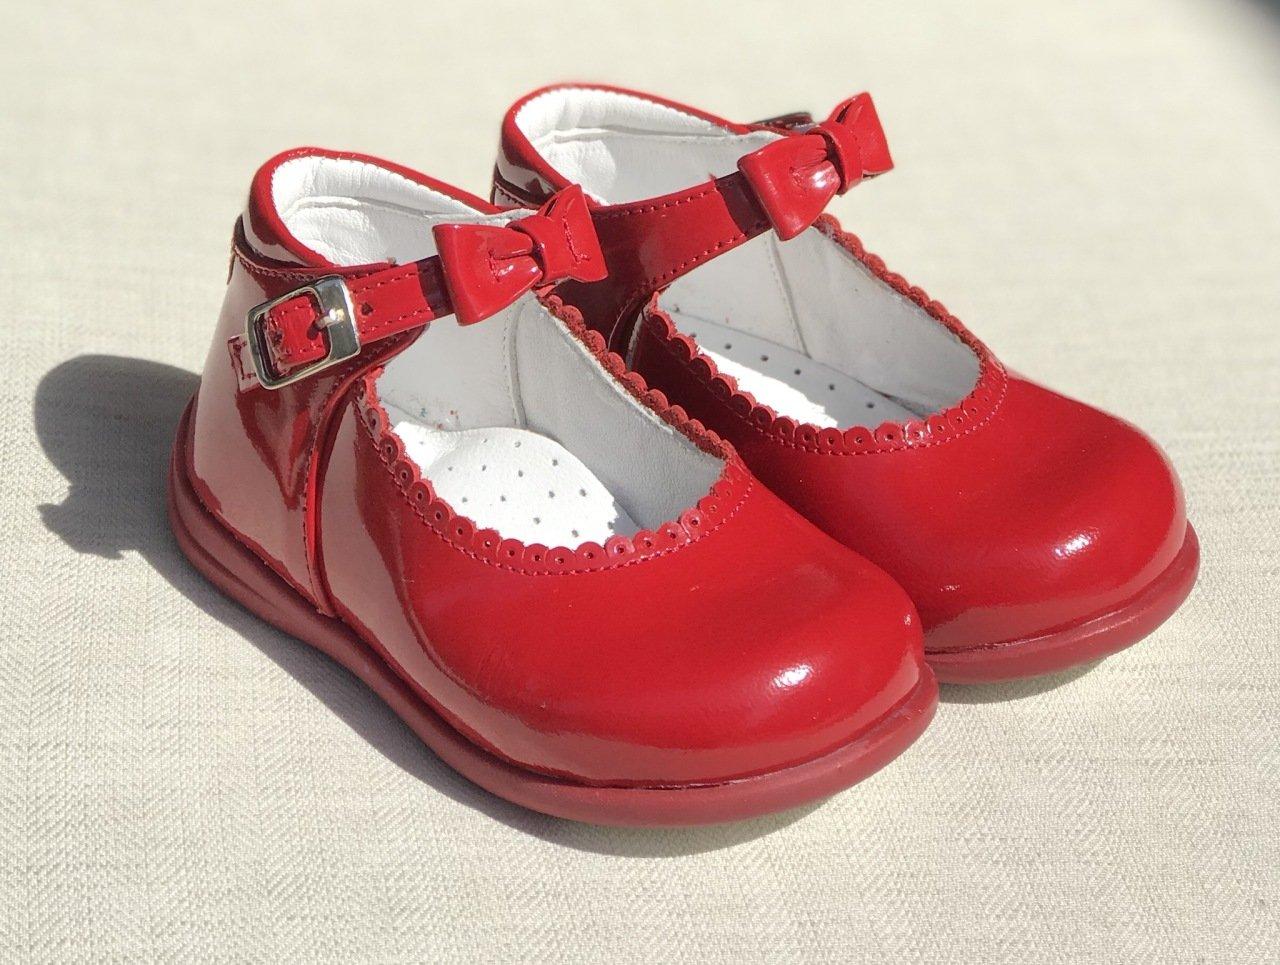 Yeni Sezon Kirmizi Rugan Ayakkabi